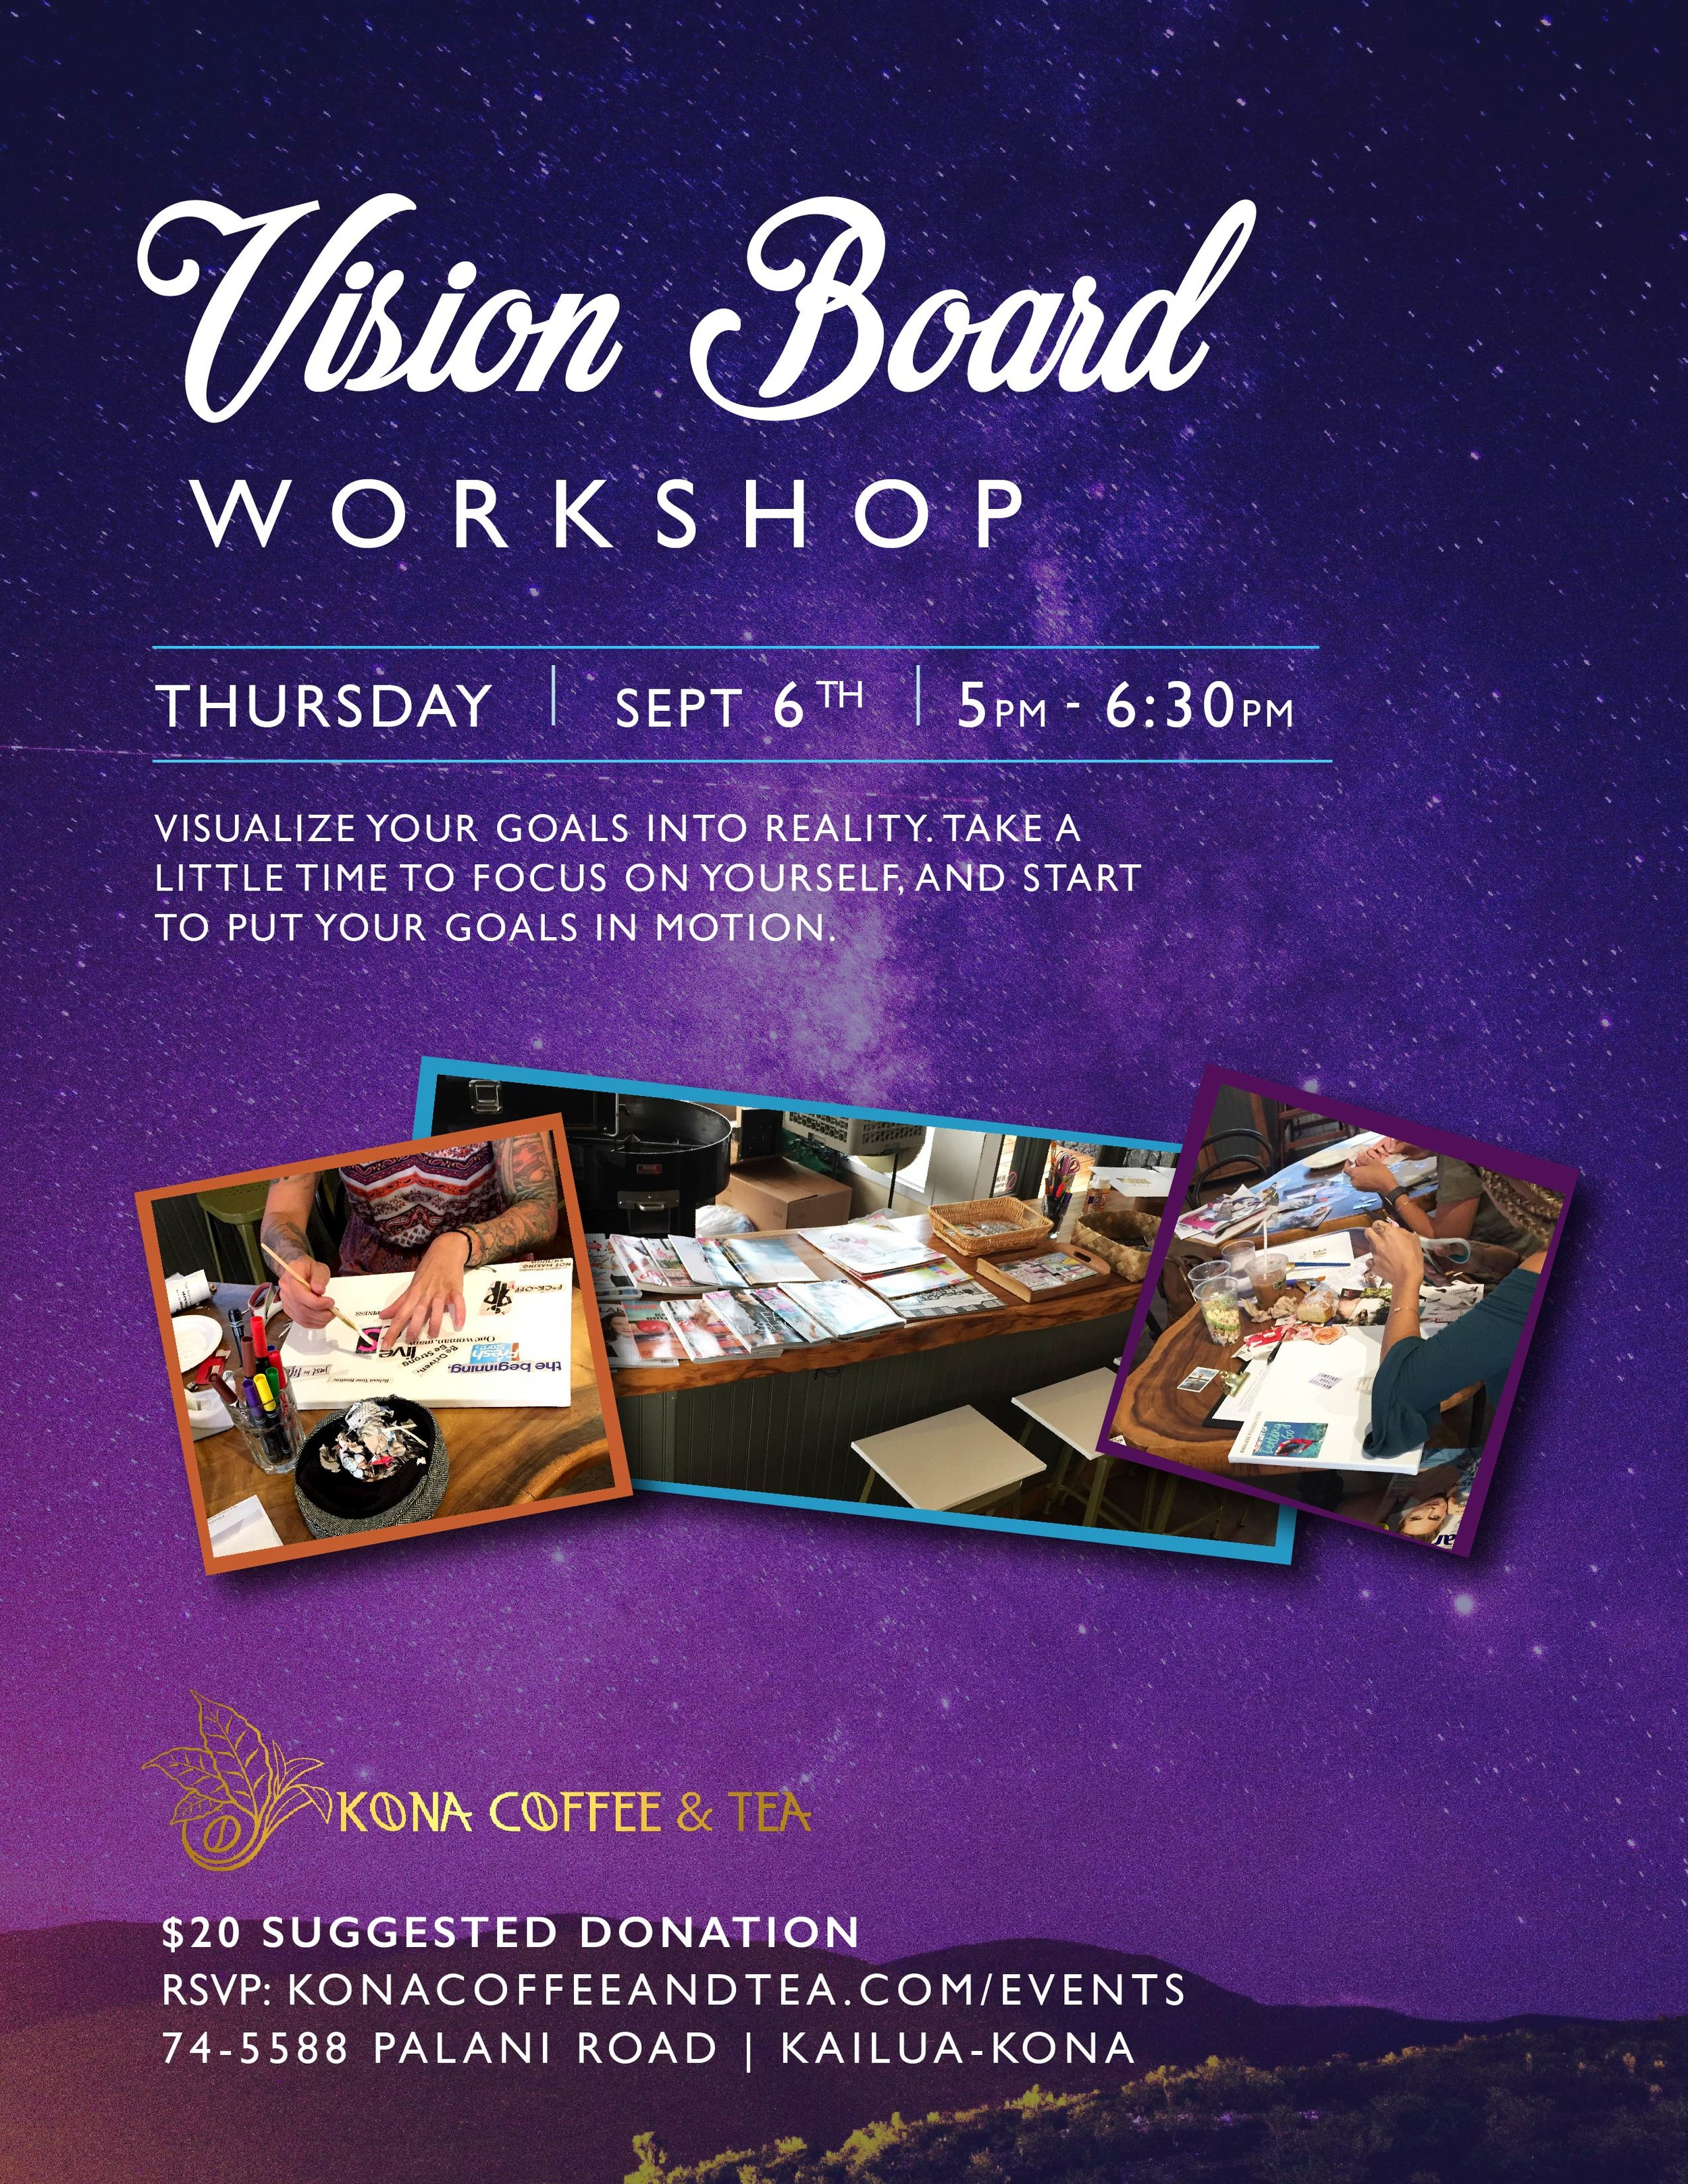 Vision Board Workshop_9.6.18-01.jpg